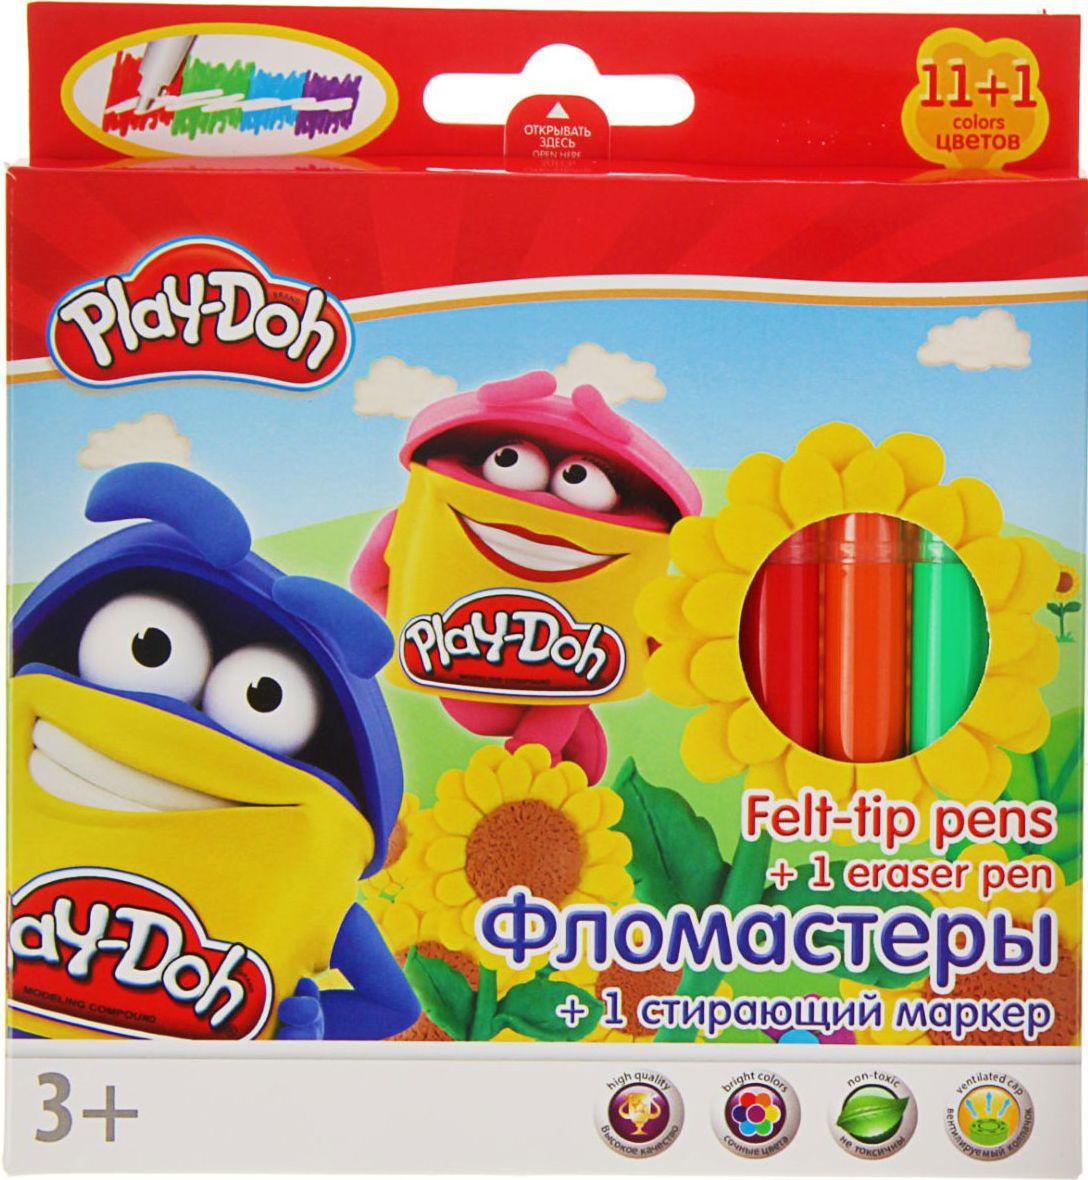 Play-Doh Набор фломастеров со стирающим маркером 12 цветов1397540